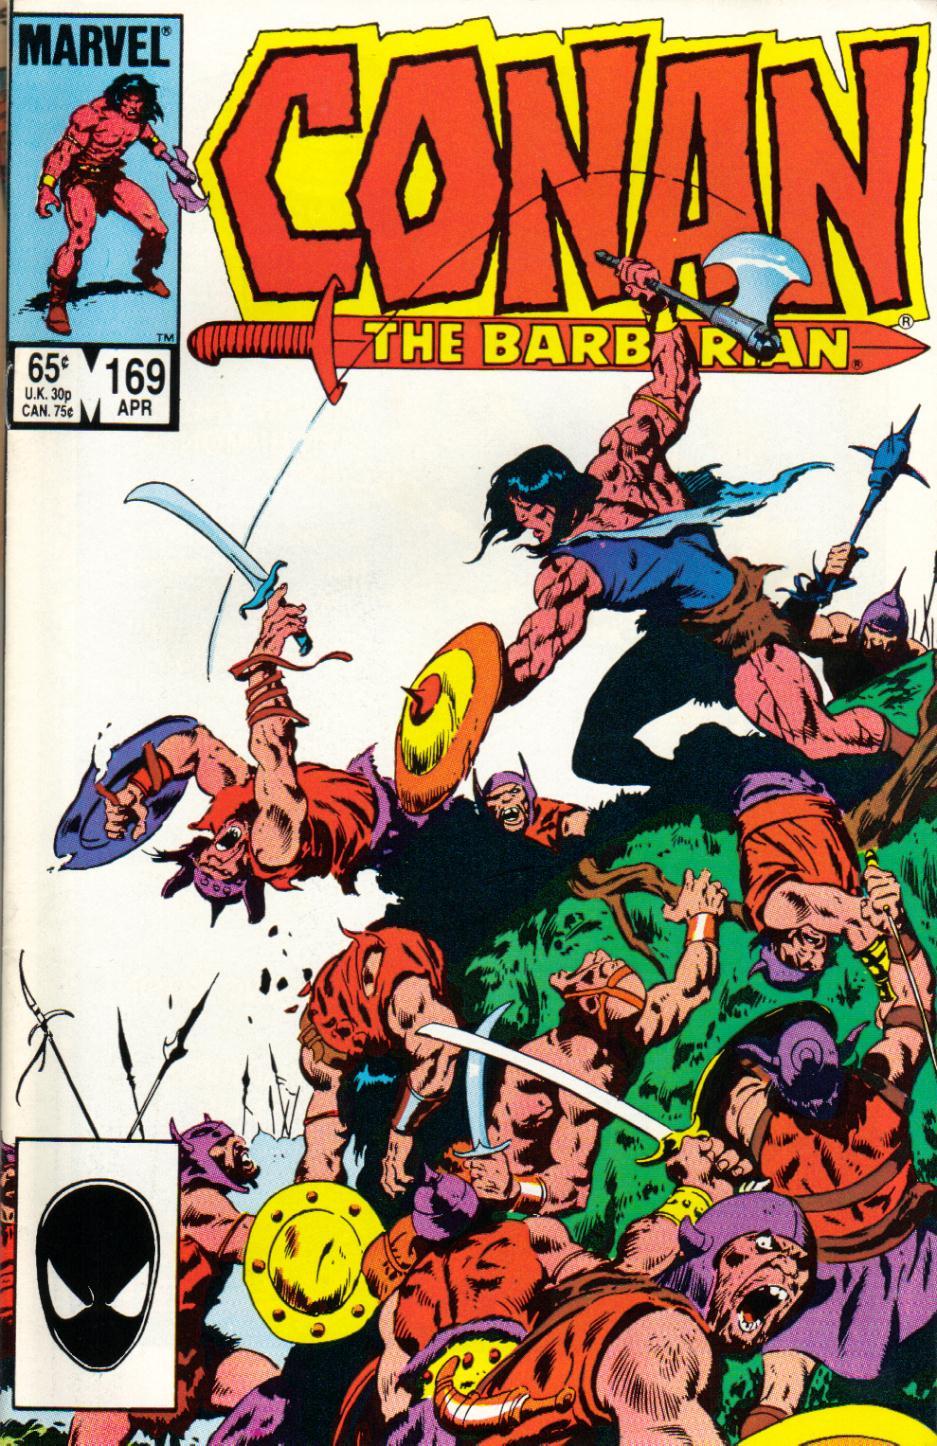 Conan the Barbarian 169